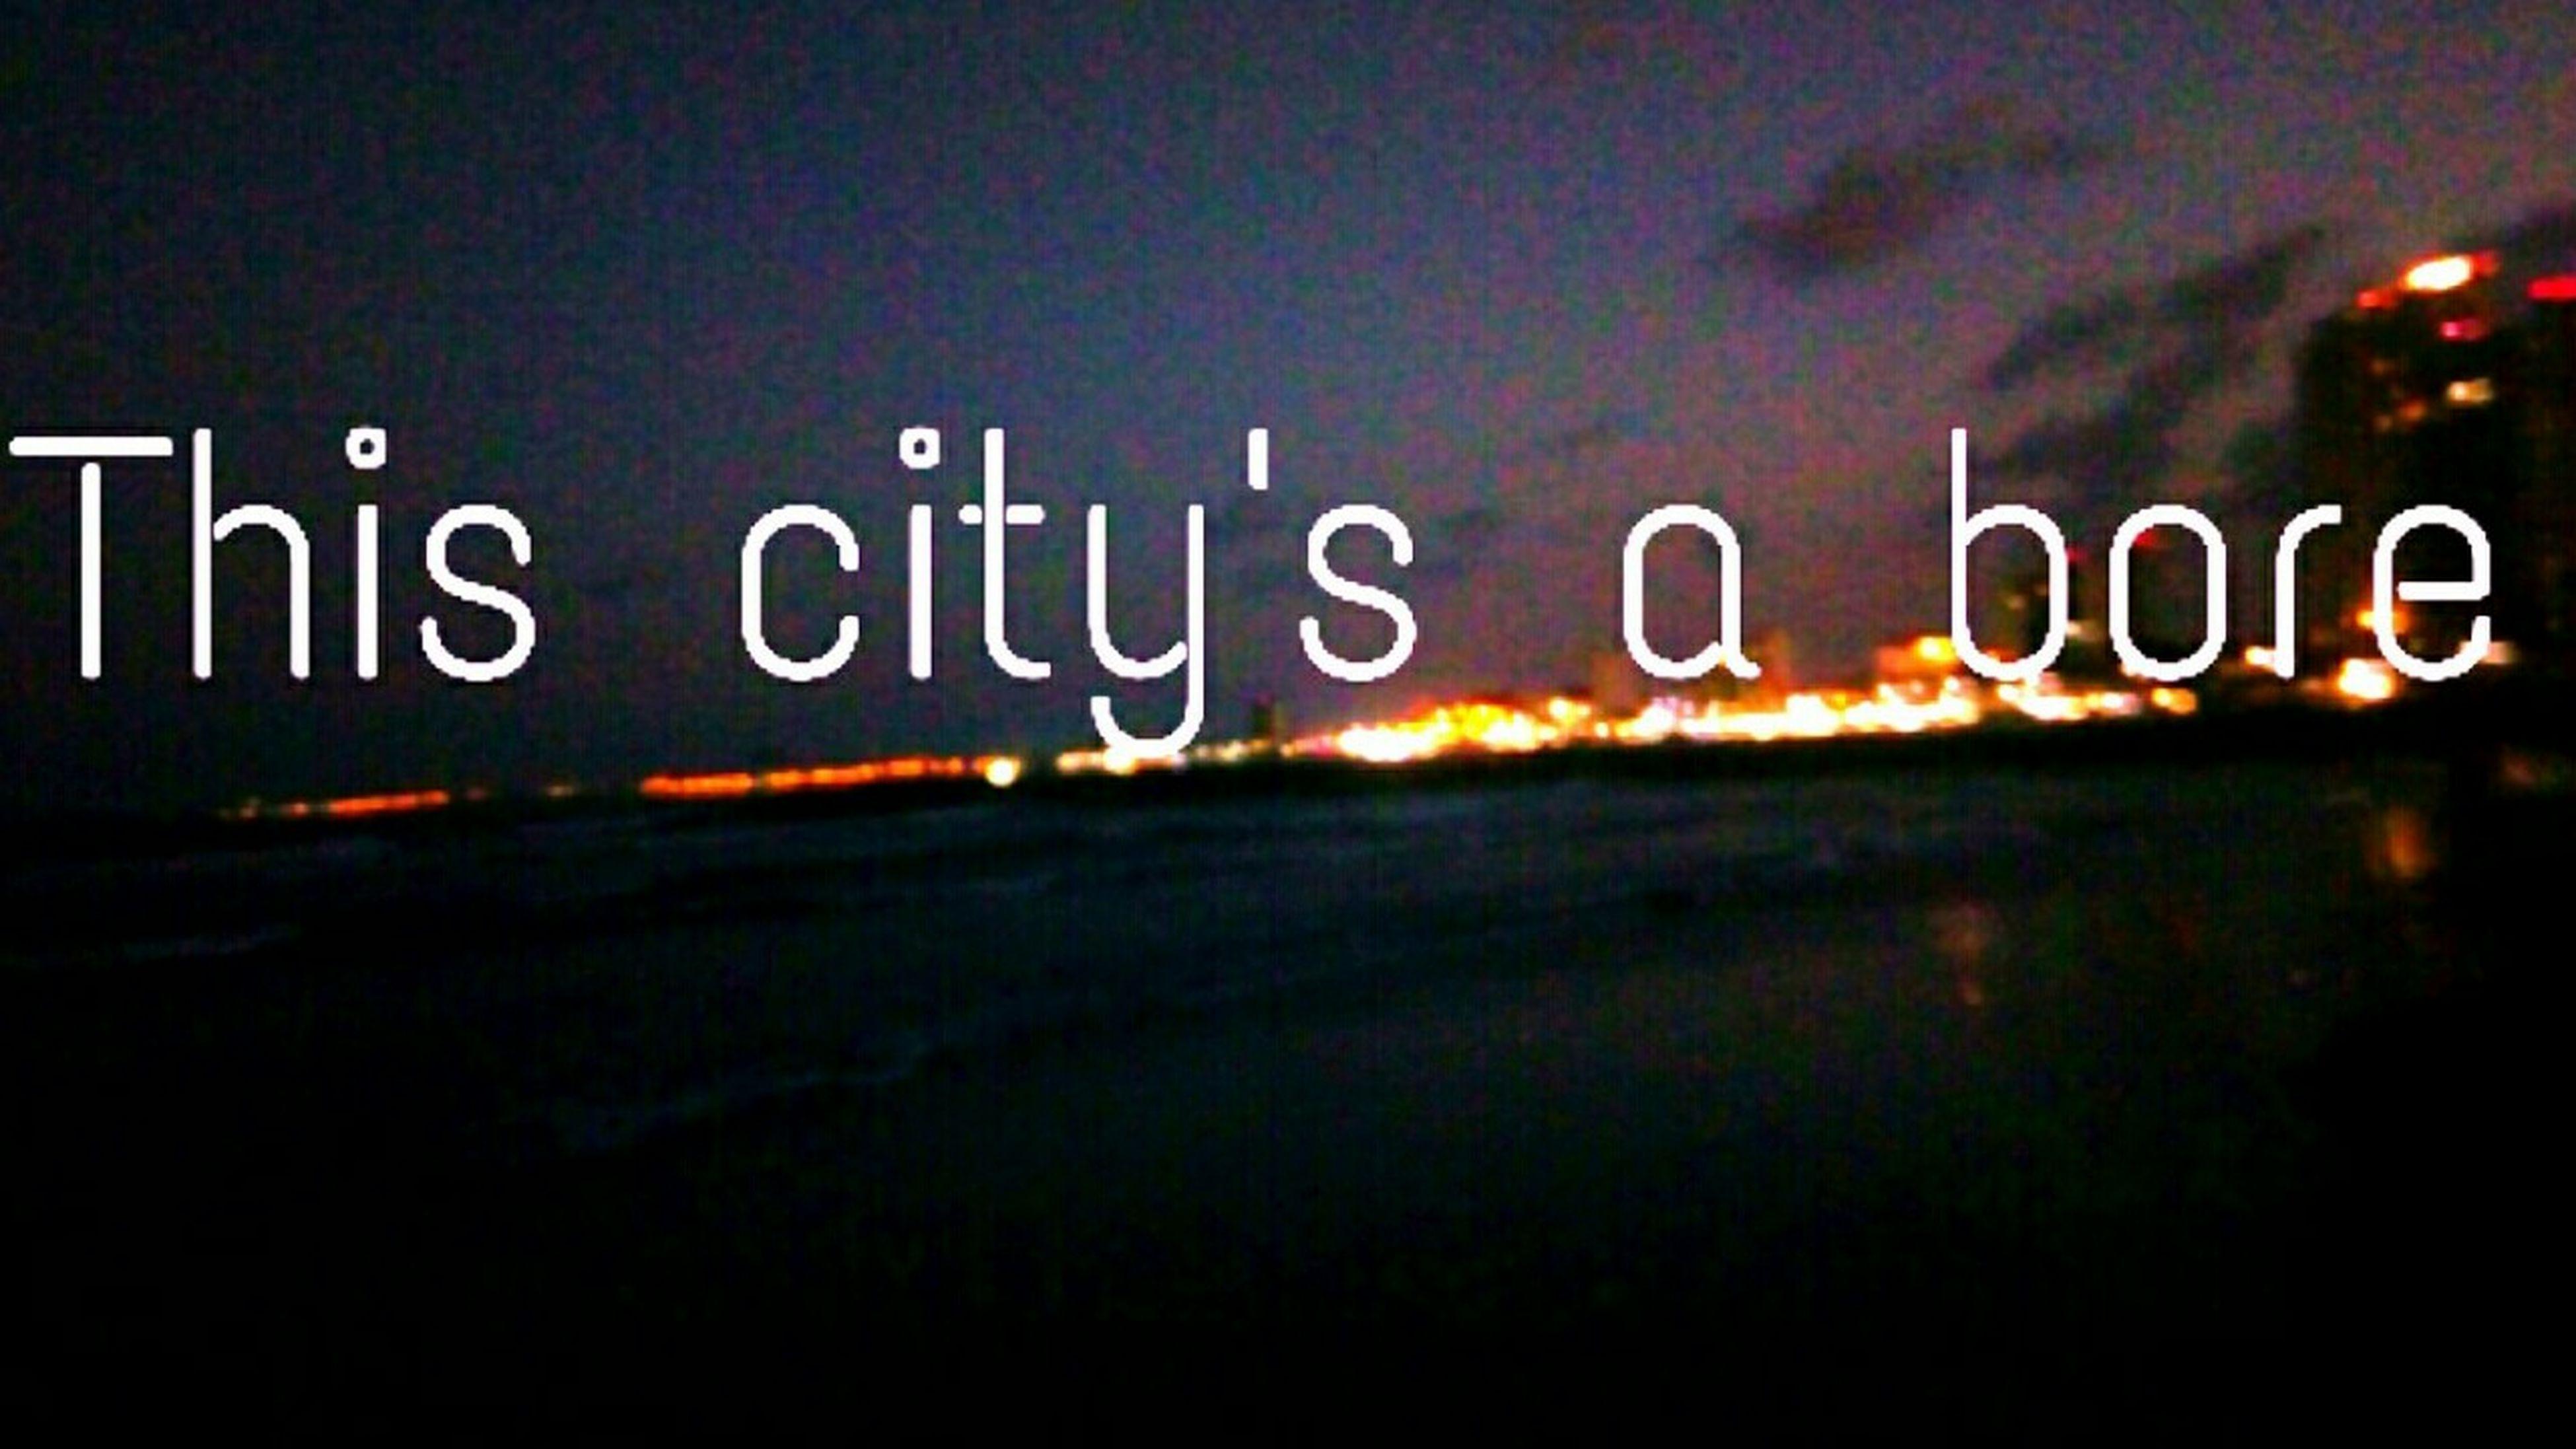 text, western script, communication, no people, illuminated, close-up, outdoors, short phrase, night, sky, formula